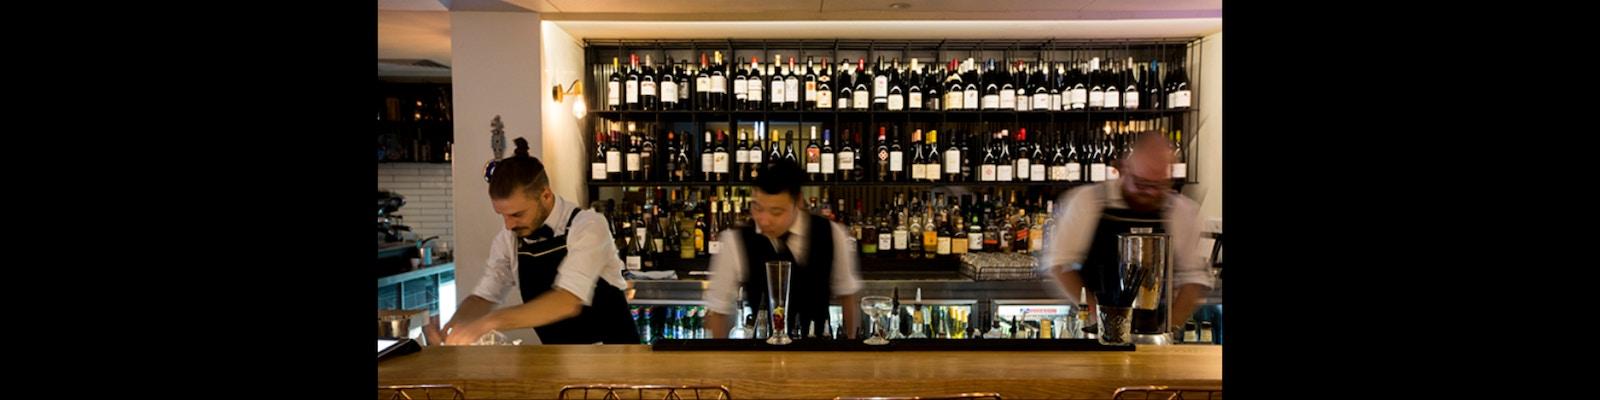 Maha Restaurant bar